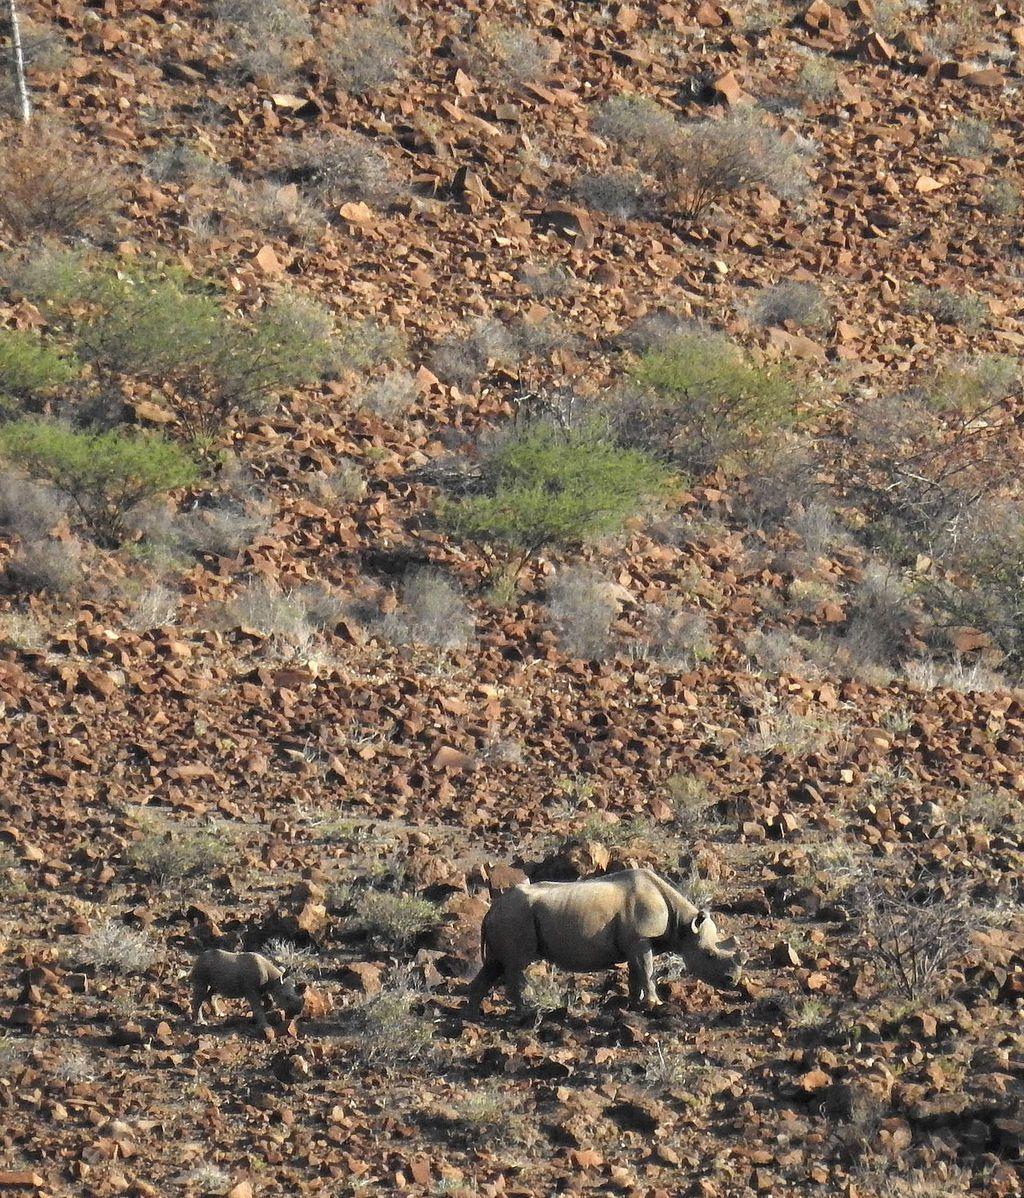 Rinocerontes en Namibia (África)